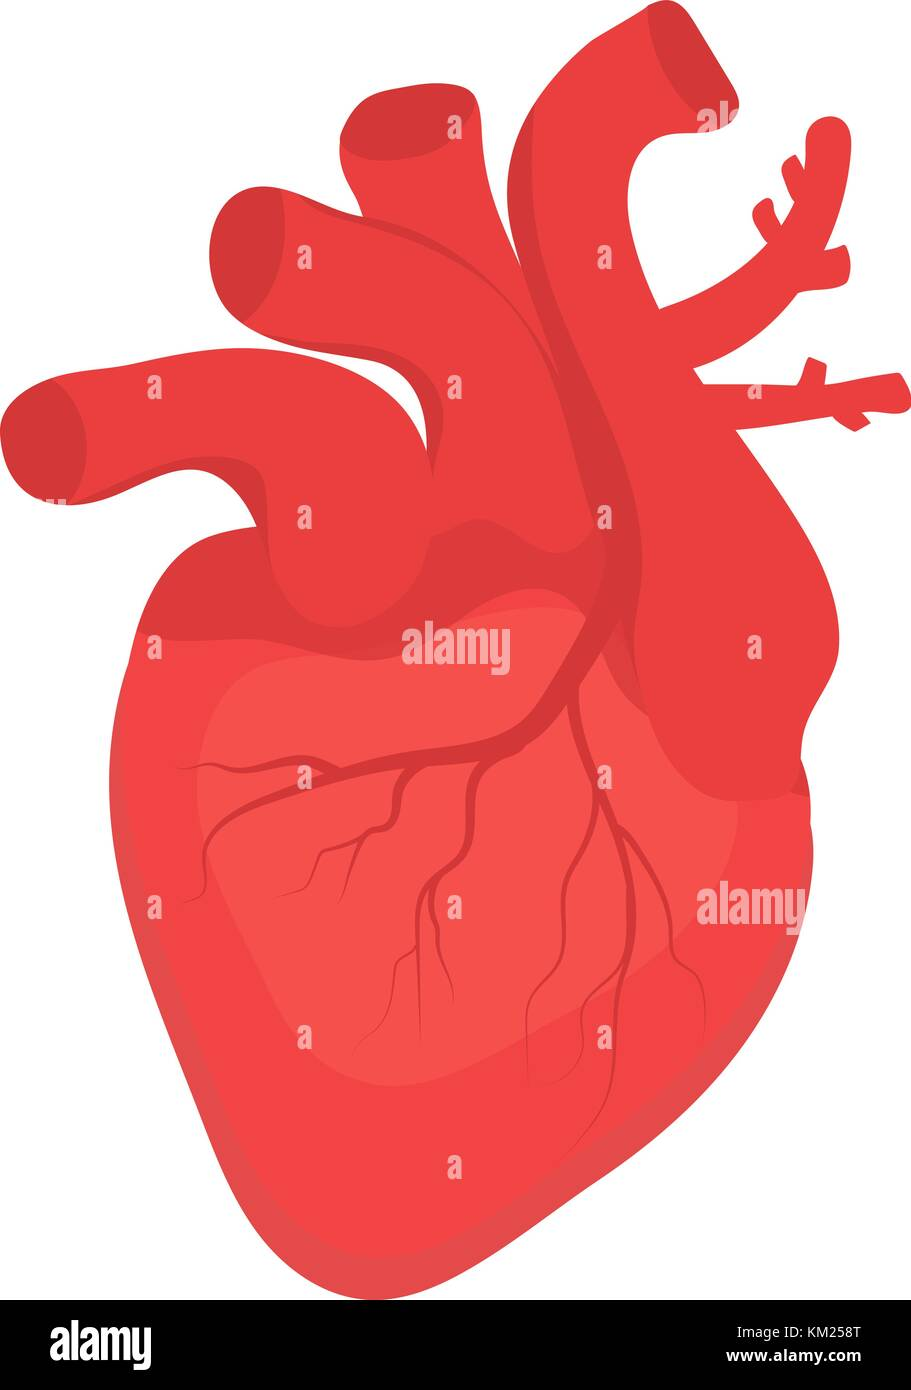 Human heart icon, flat style  Internal organs symbol